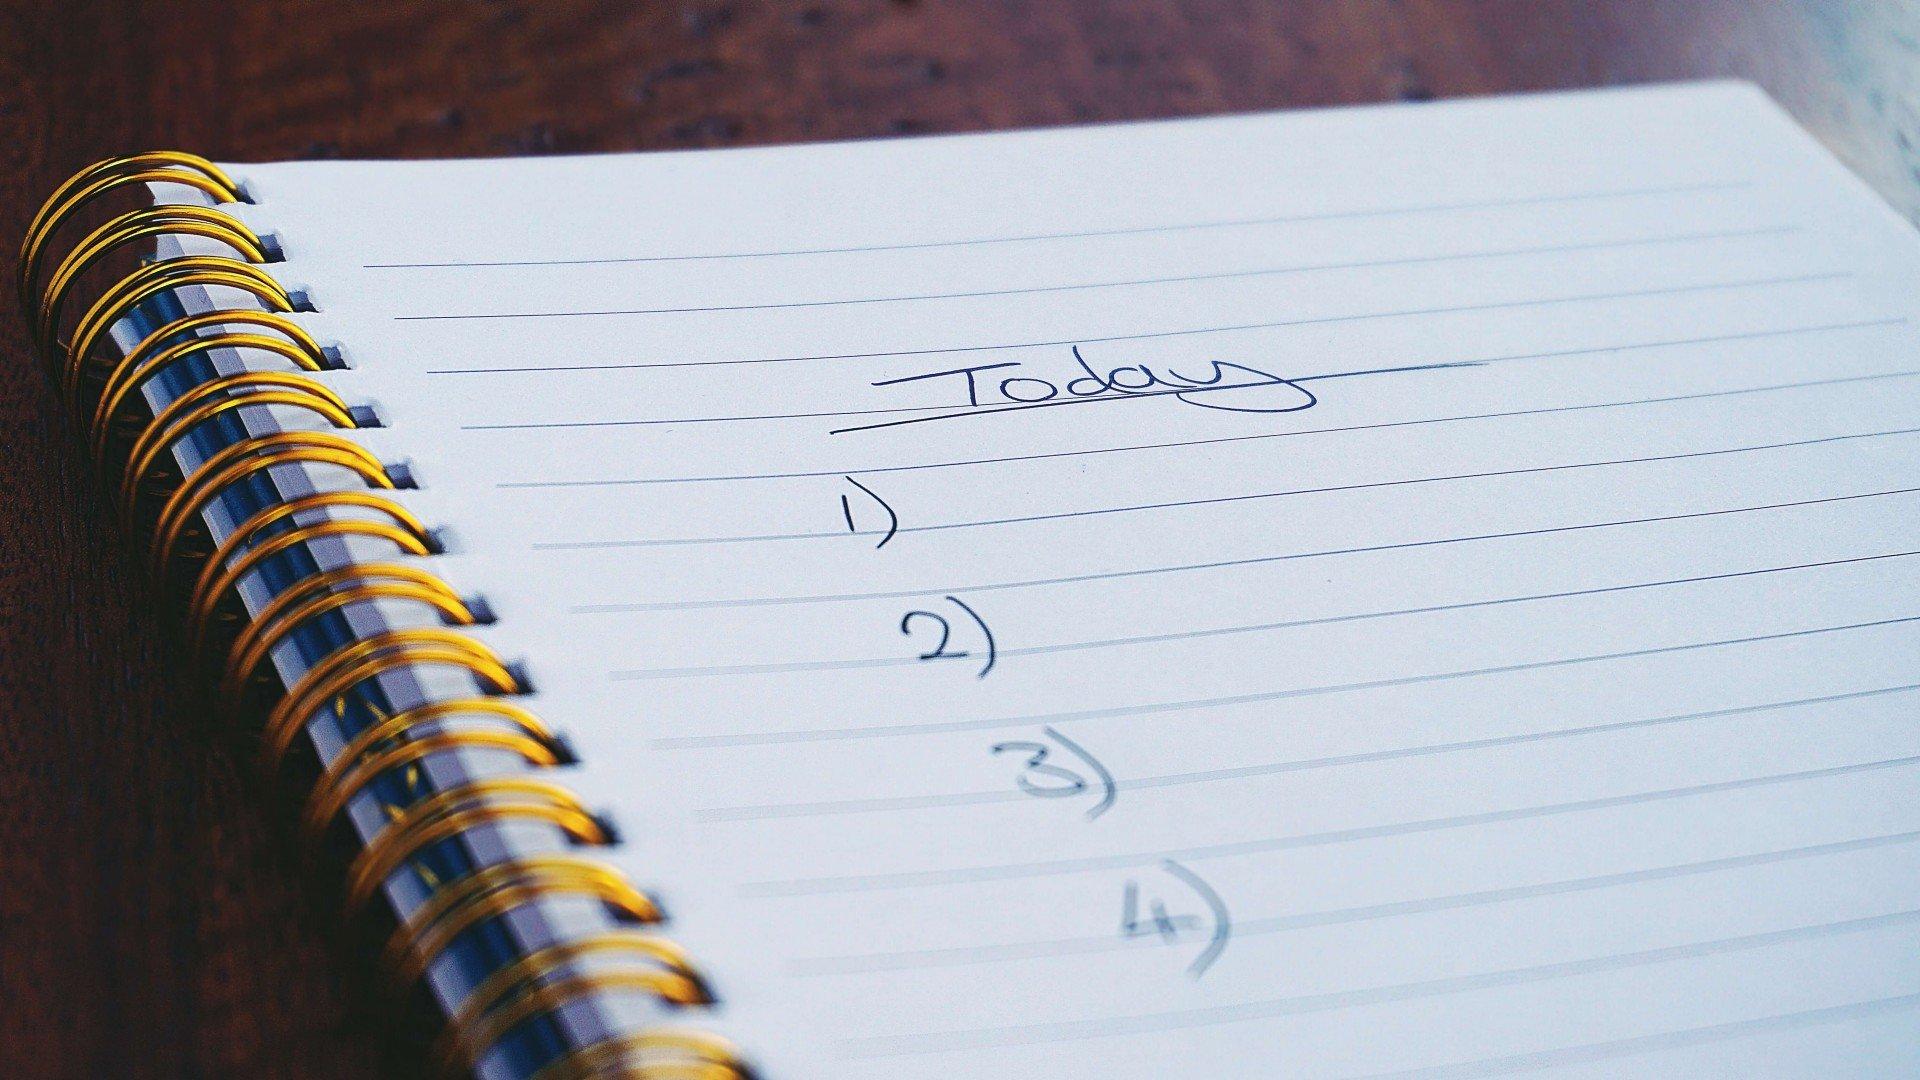 Checklist Composition Handwriting 1226398 1 1920x1080